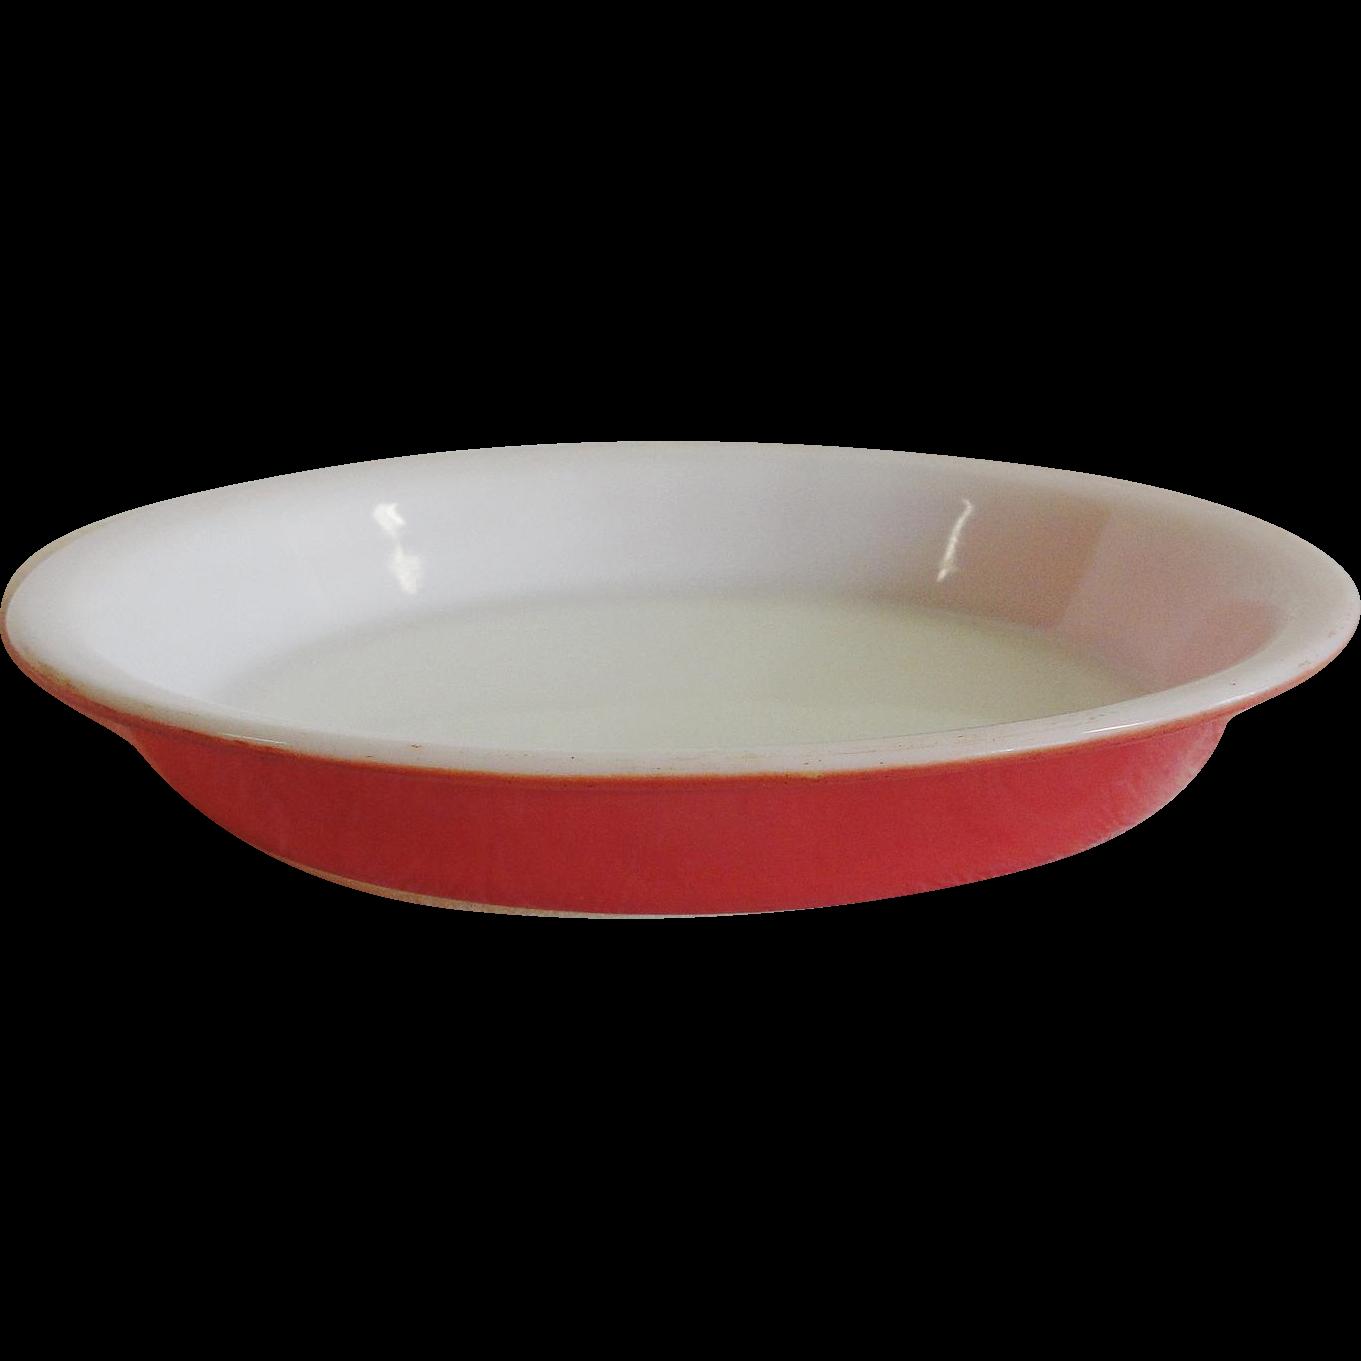 Vintage Pyrex Flamingo Pink 8 ½ Inch Pie Plate